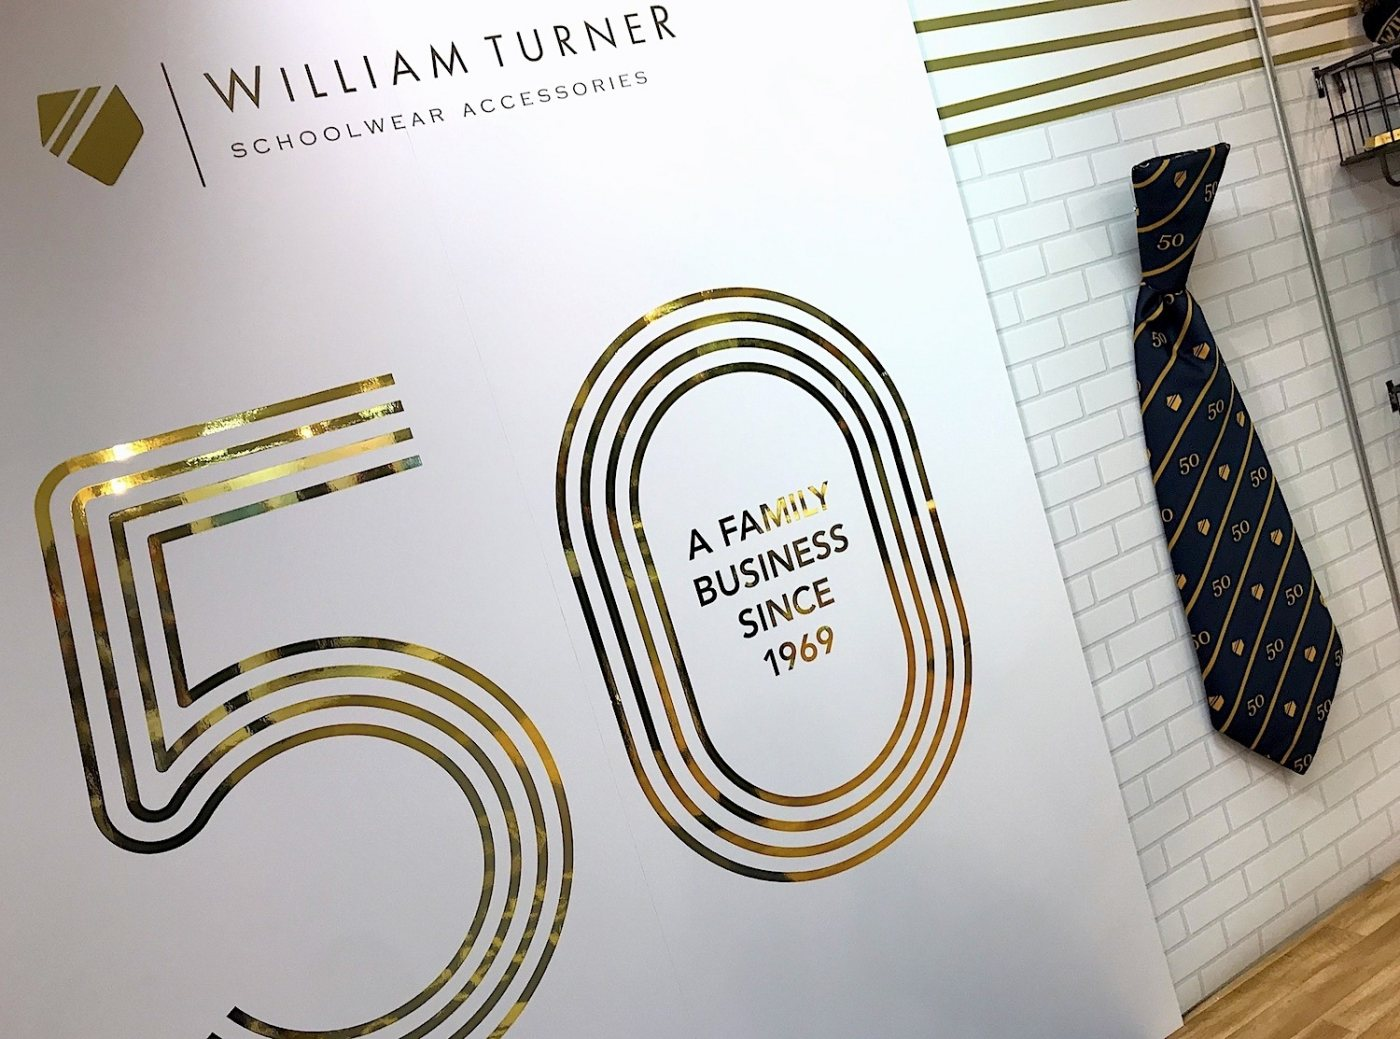 William Turner Schoolwear Show